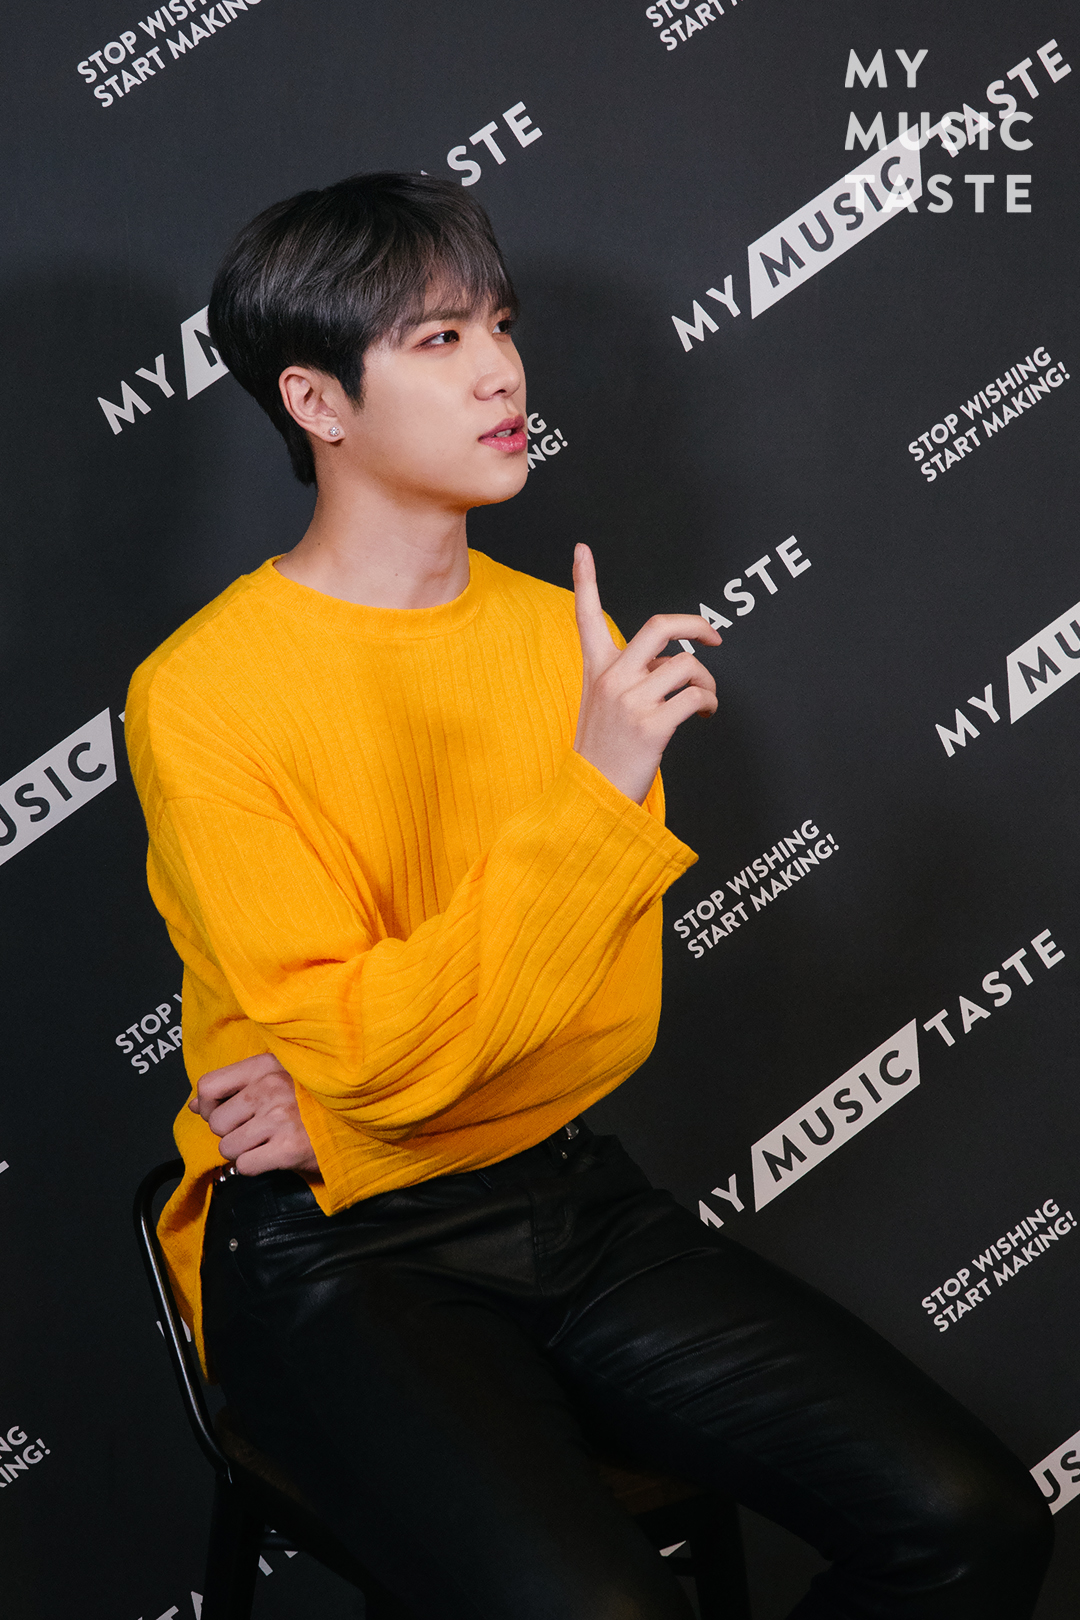 [KIM DONG HAN 2019] Blog Interview Photo_02.jpg